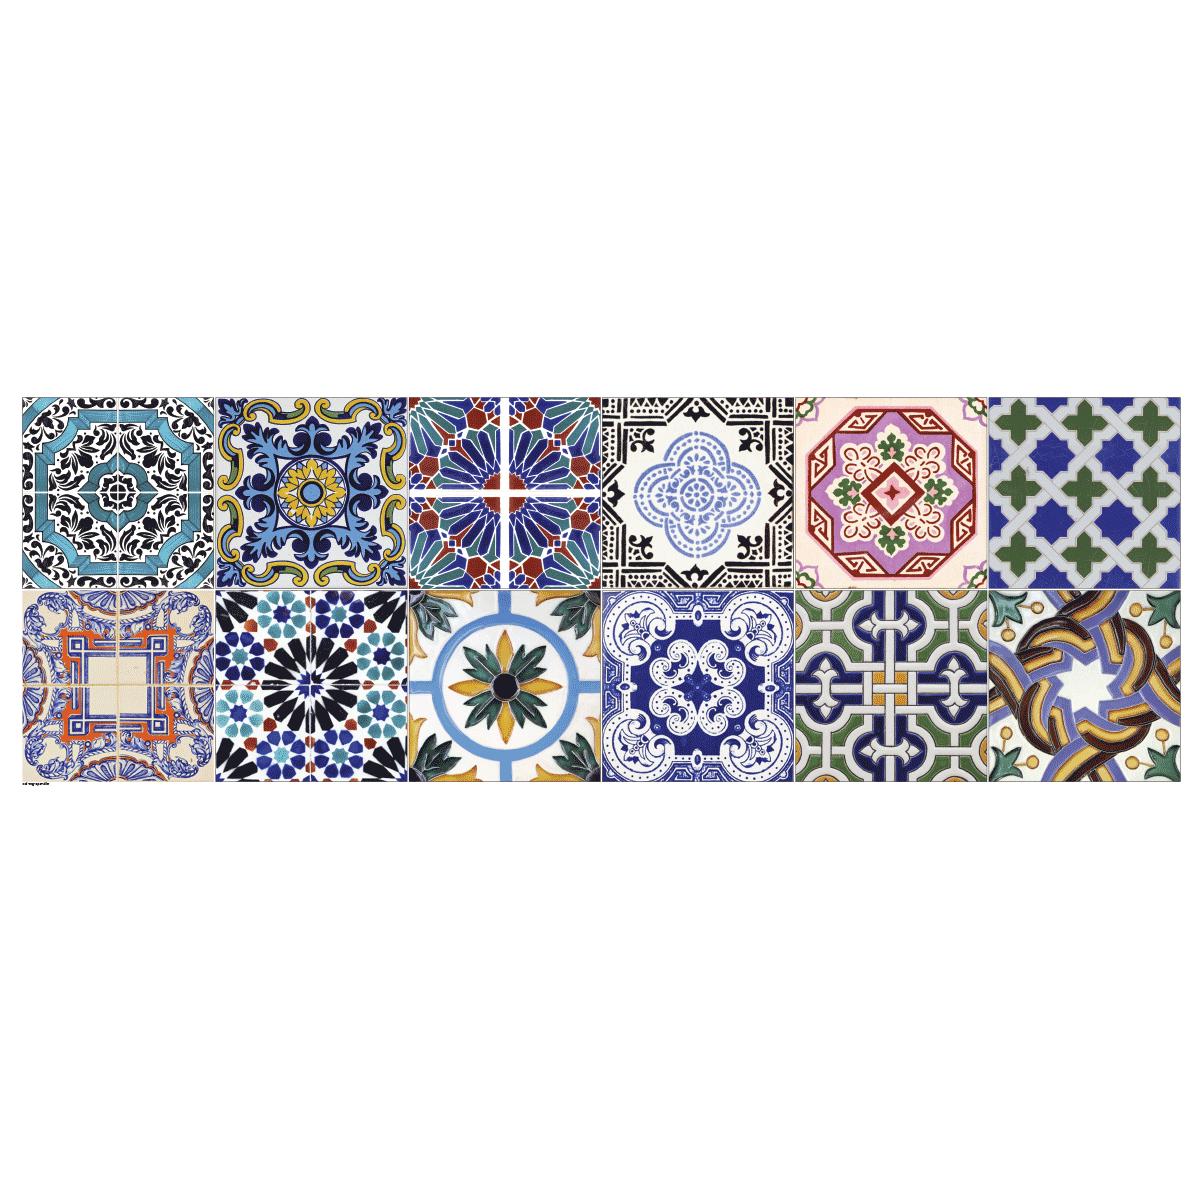 12 stickers carrelages ornements stickers art et design artistiques ambiance sticker. Black Bedroom Furniture Sets. Home Design Ideas